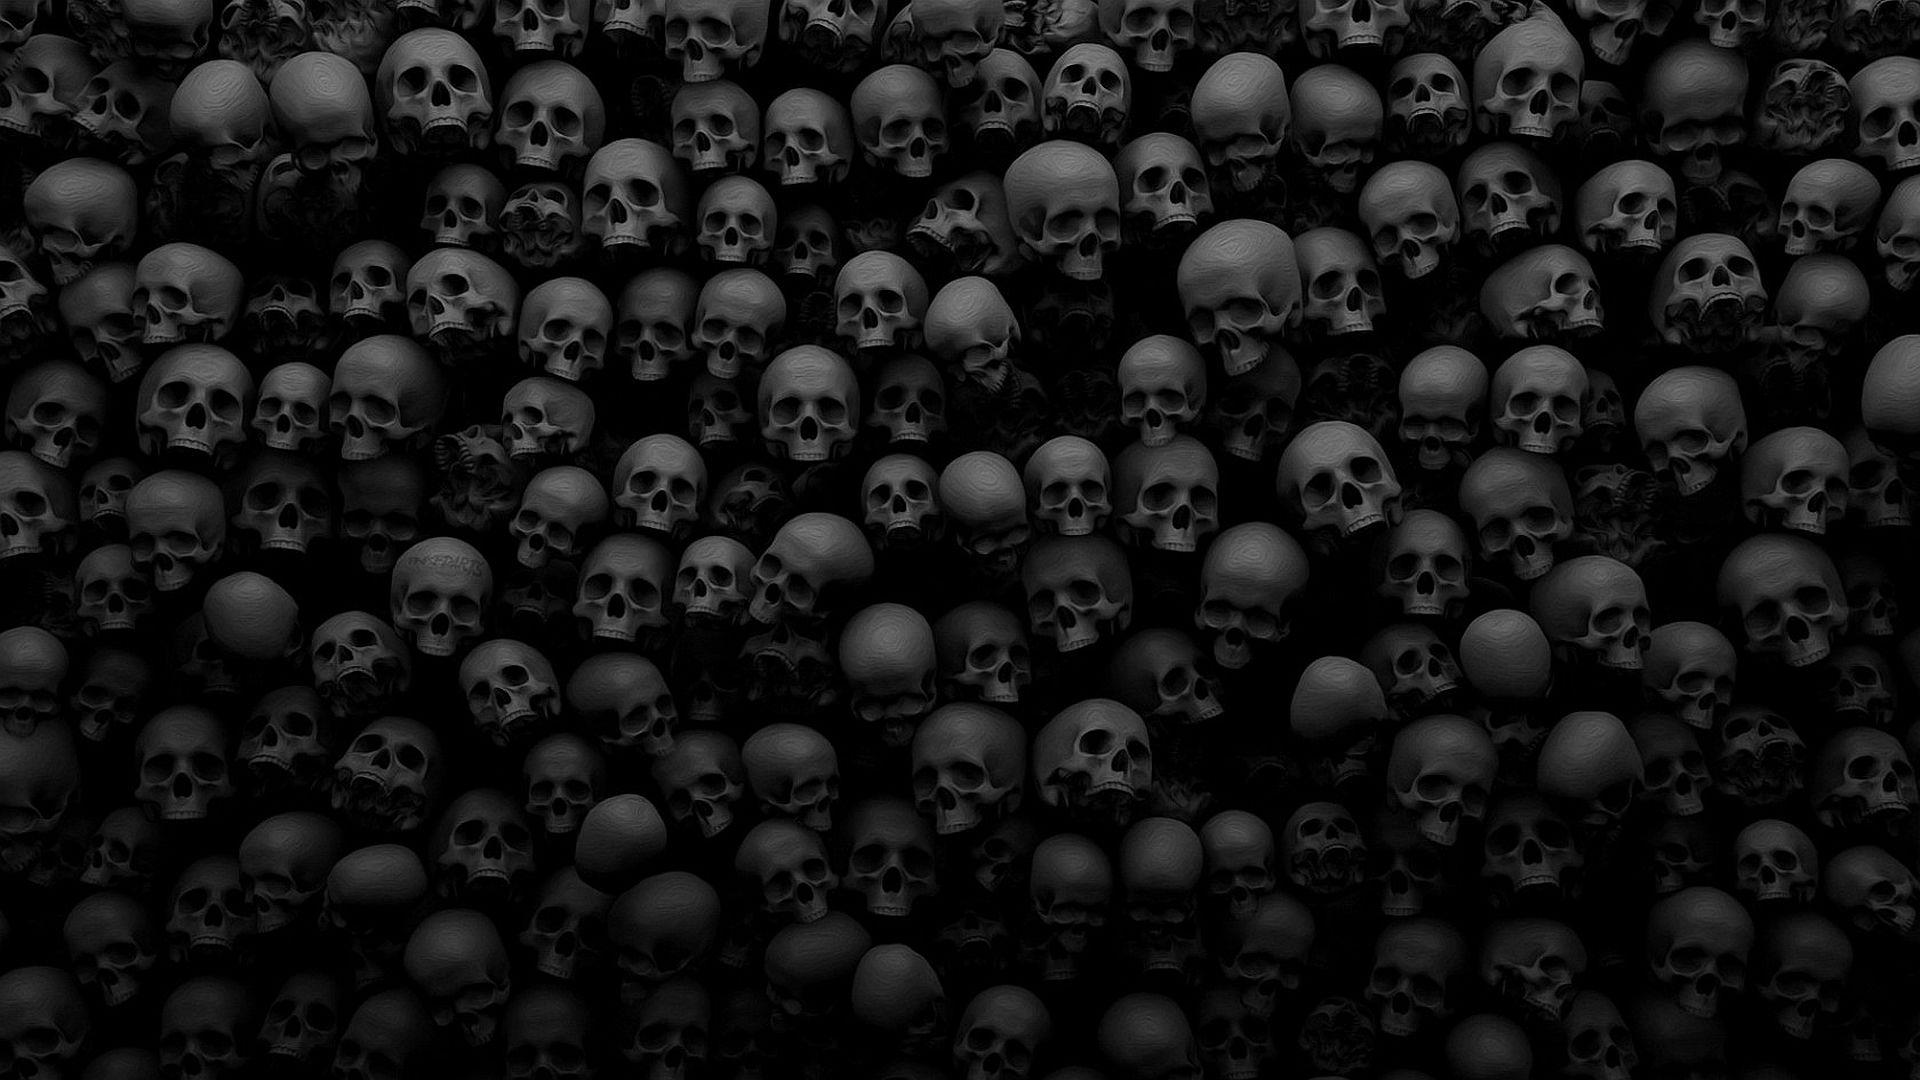 Black Skull Wallpaper Posted By John Mercado